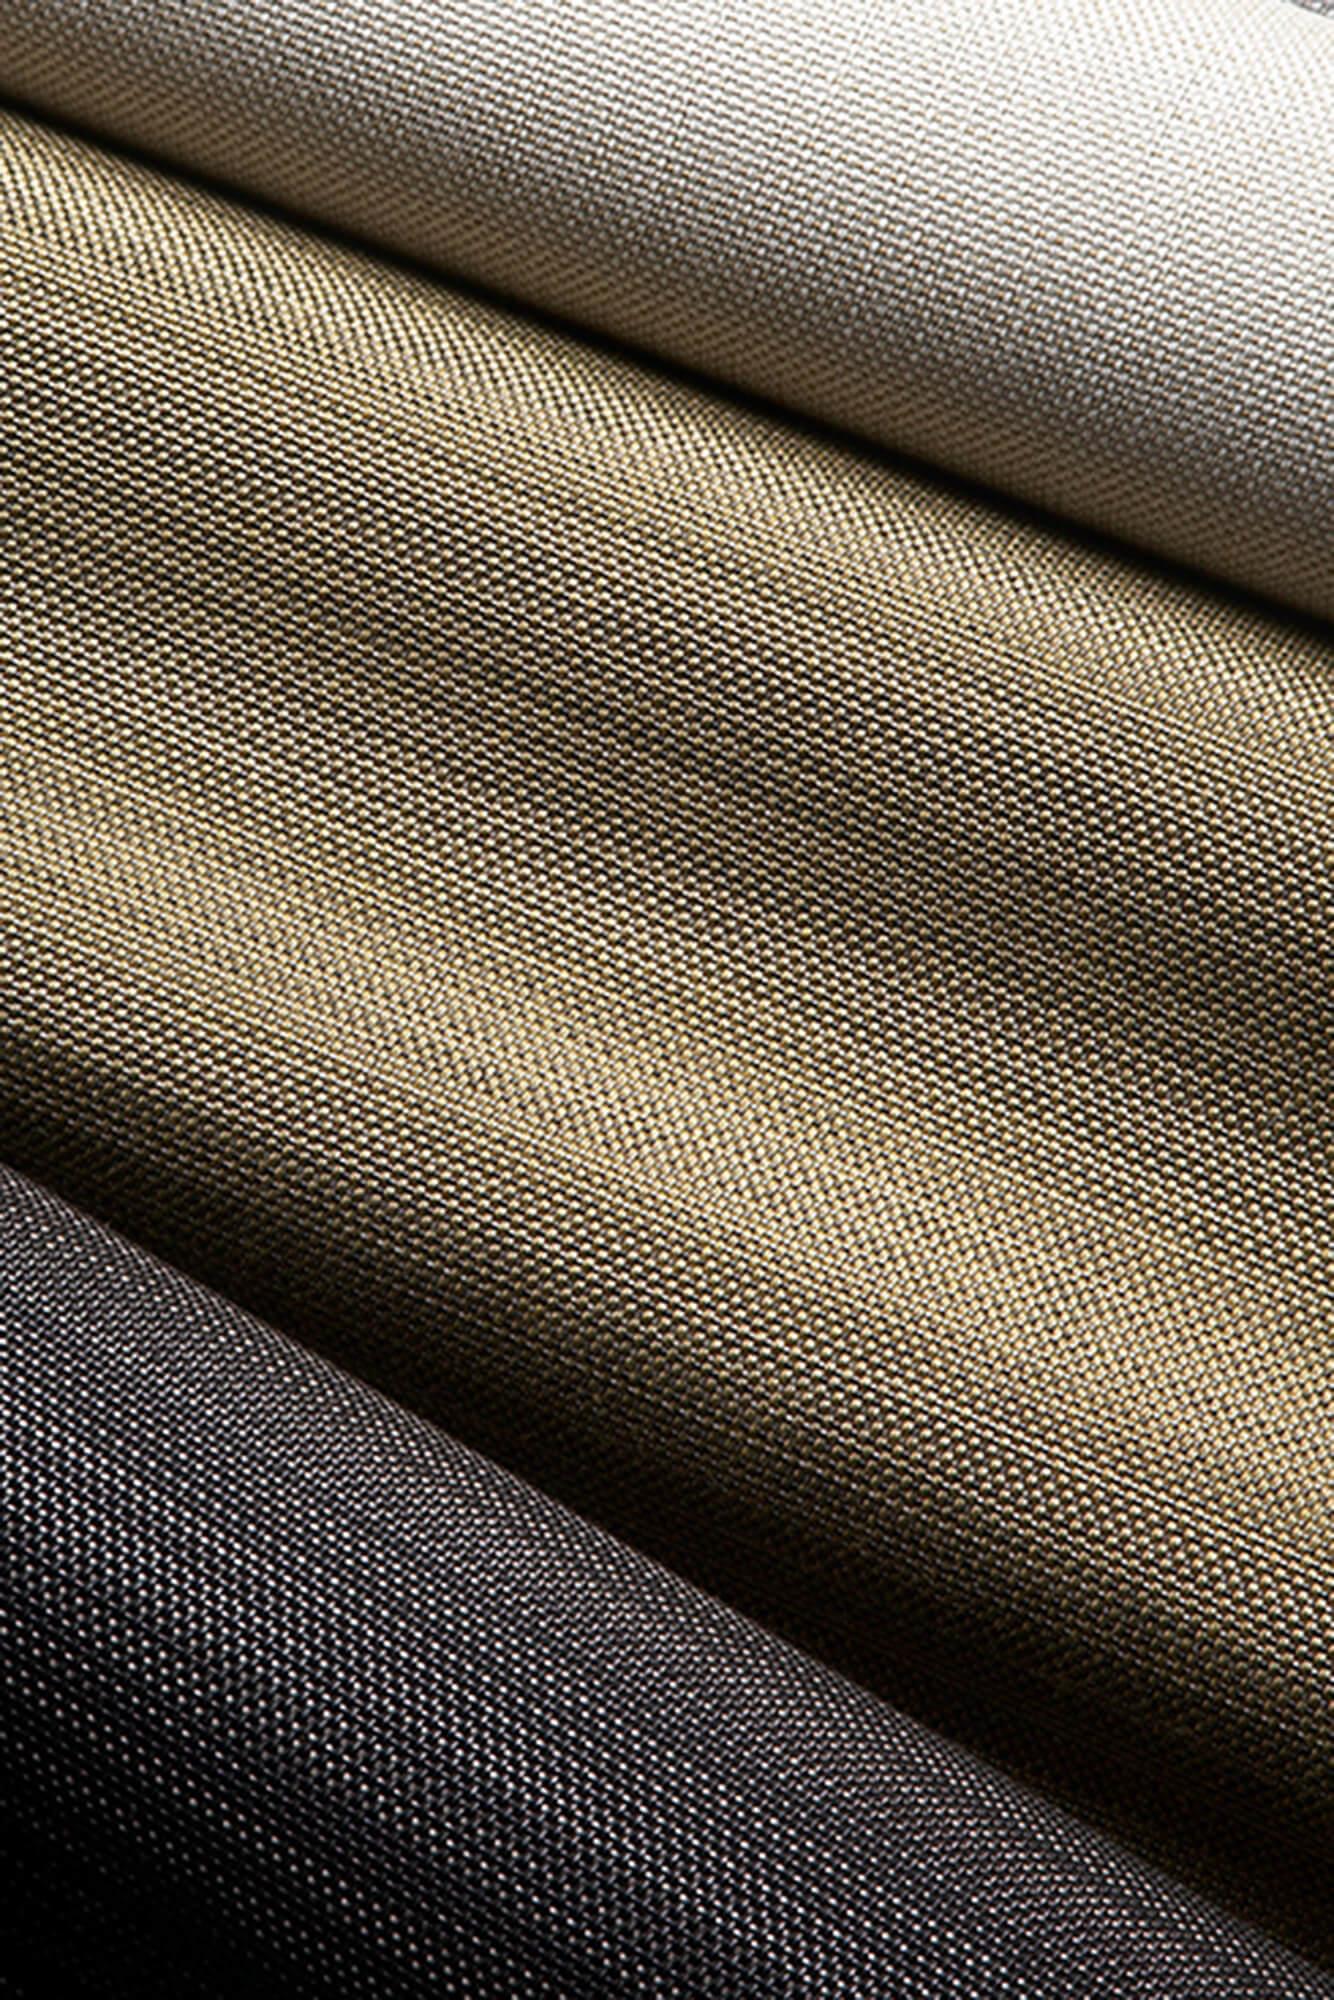 Glamour image of metallic Sunbrella Alloy fabrics